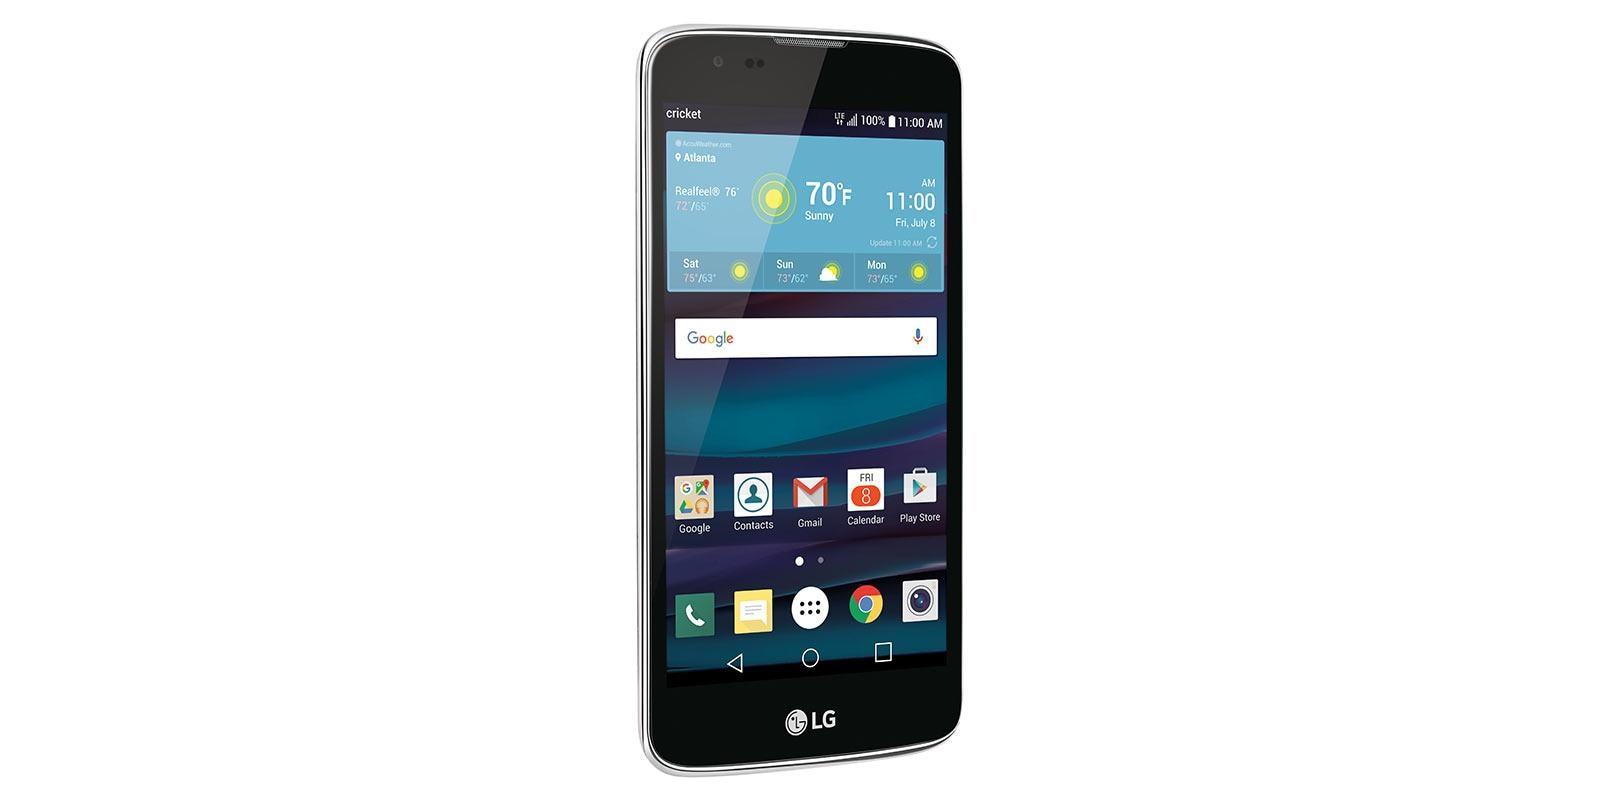 Lg Escape 3 Cricket Wireless Smartphone K373 Blue Usa Att Phone Internet Wiring Diagram